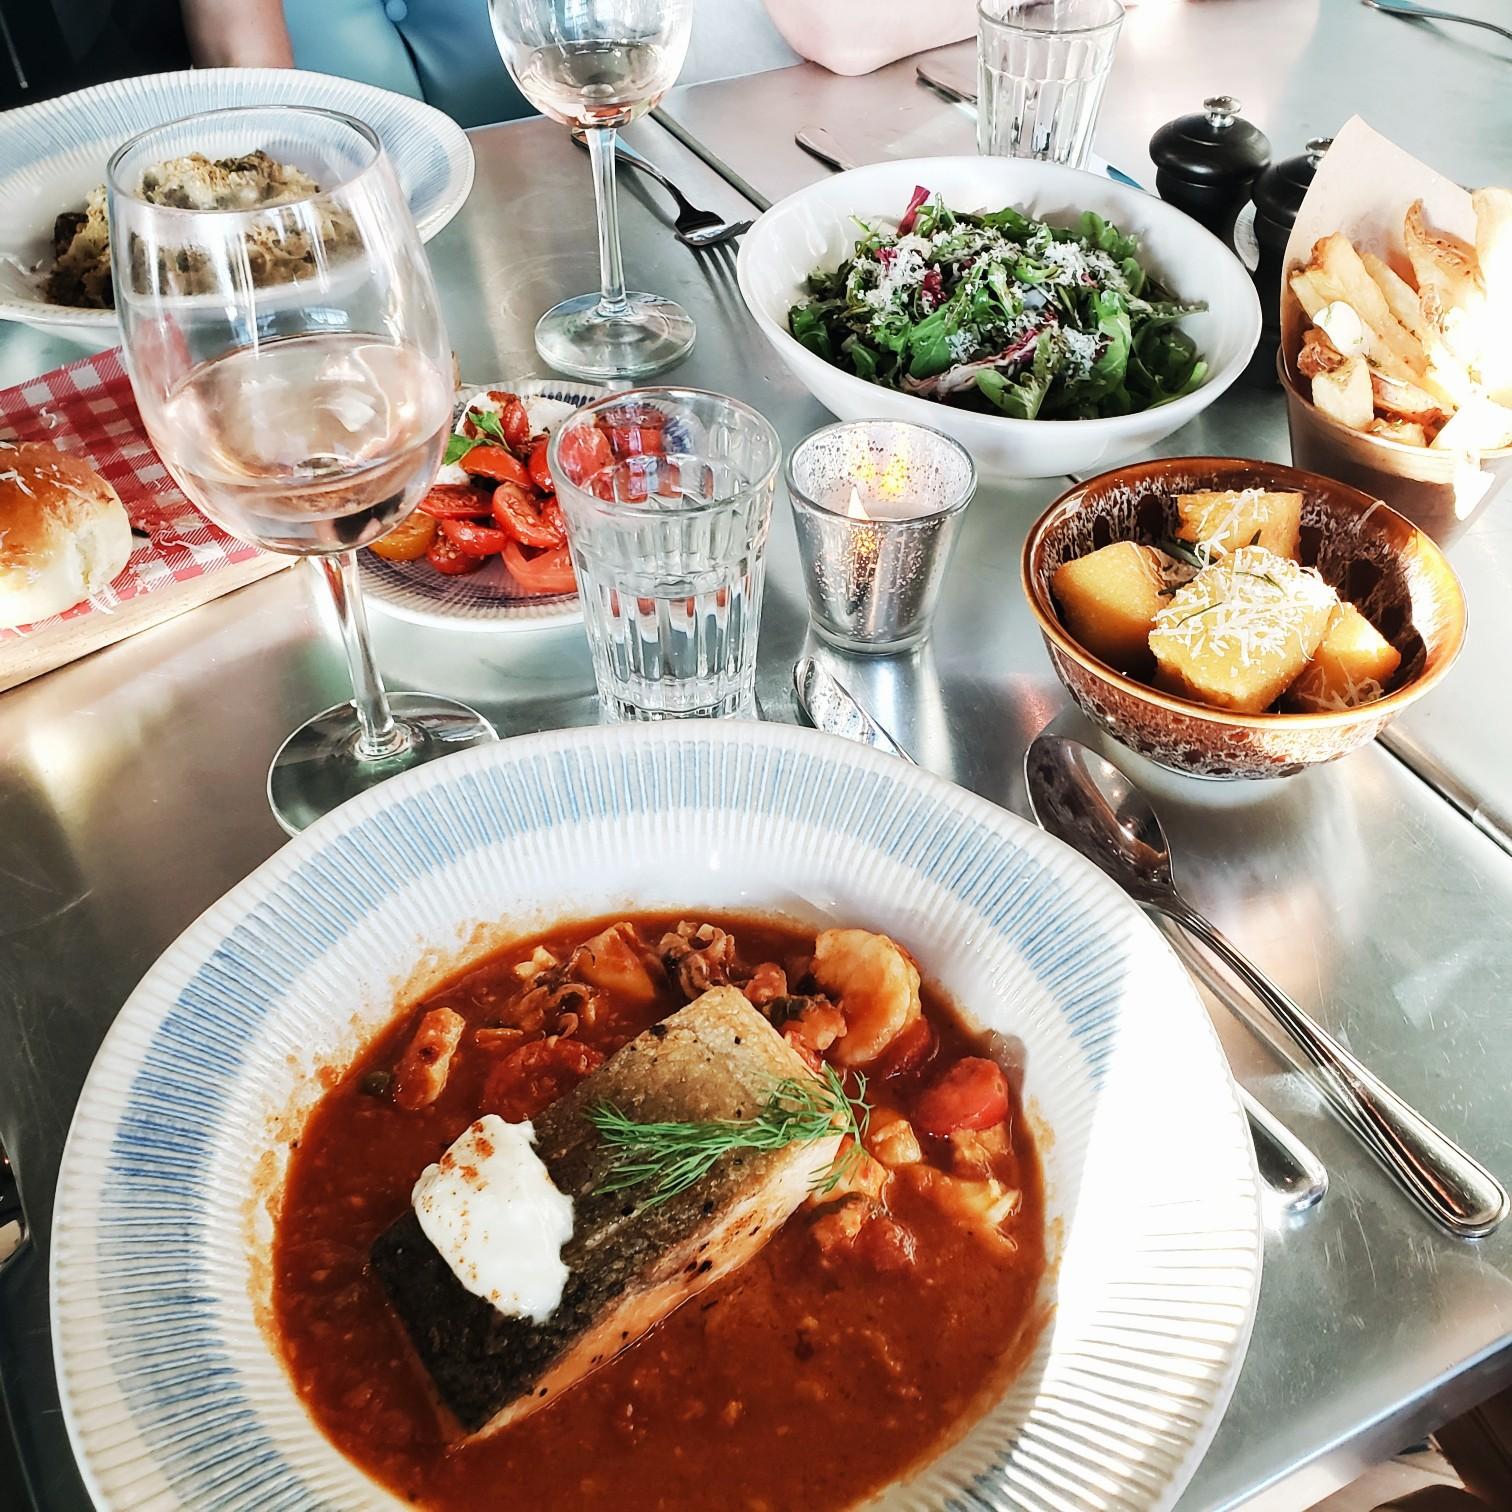 Jamie's Italian Salmon Dinner at Royal Caribbean Cruise